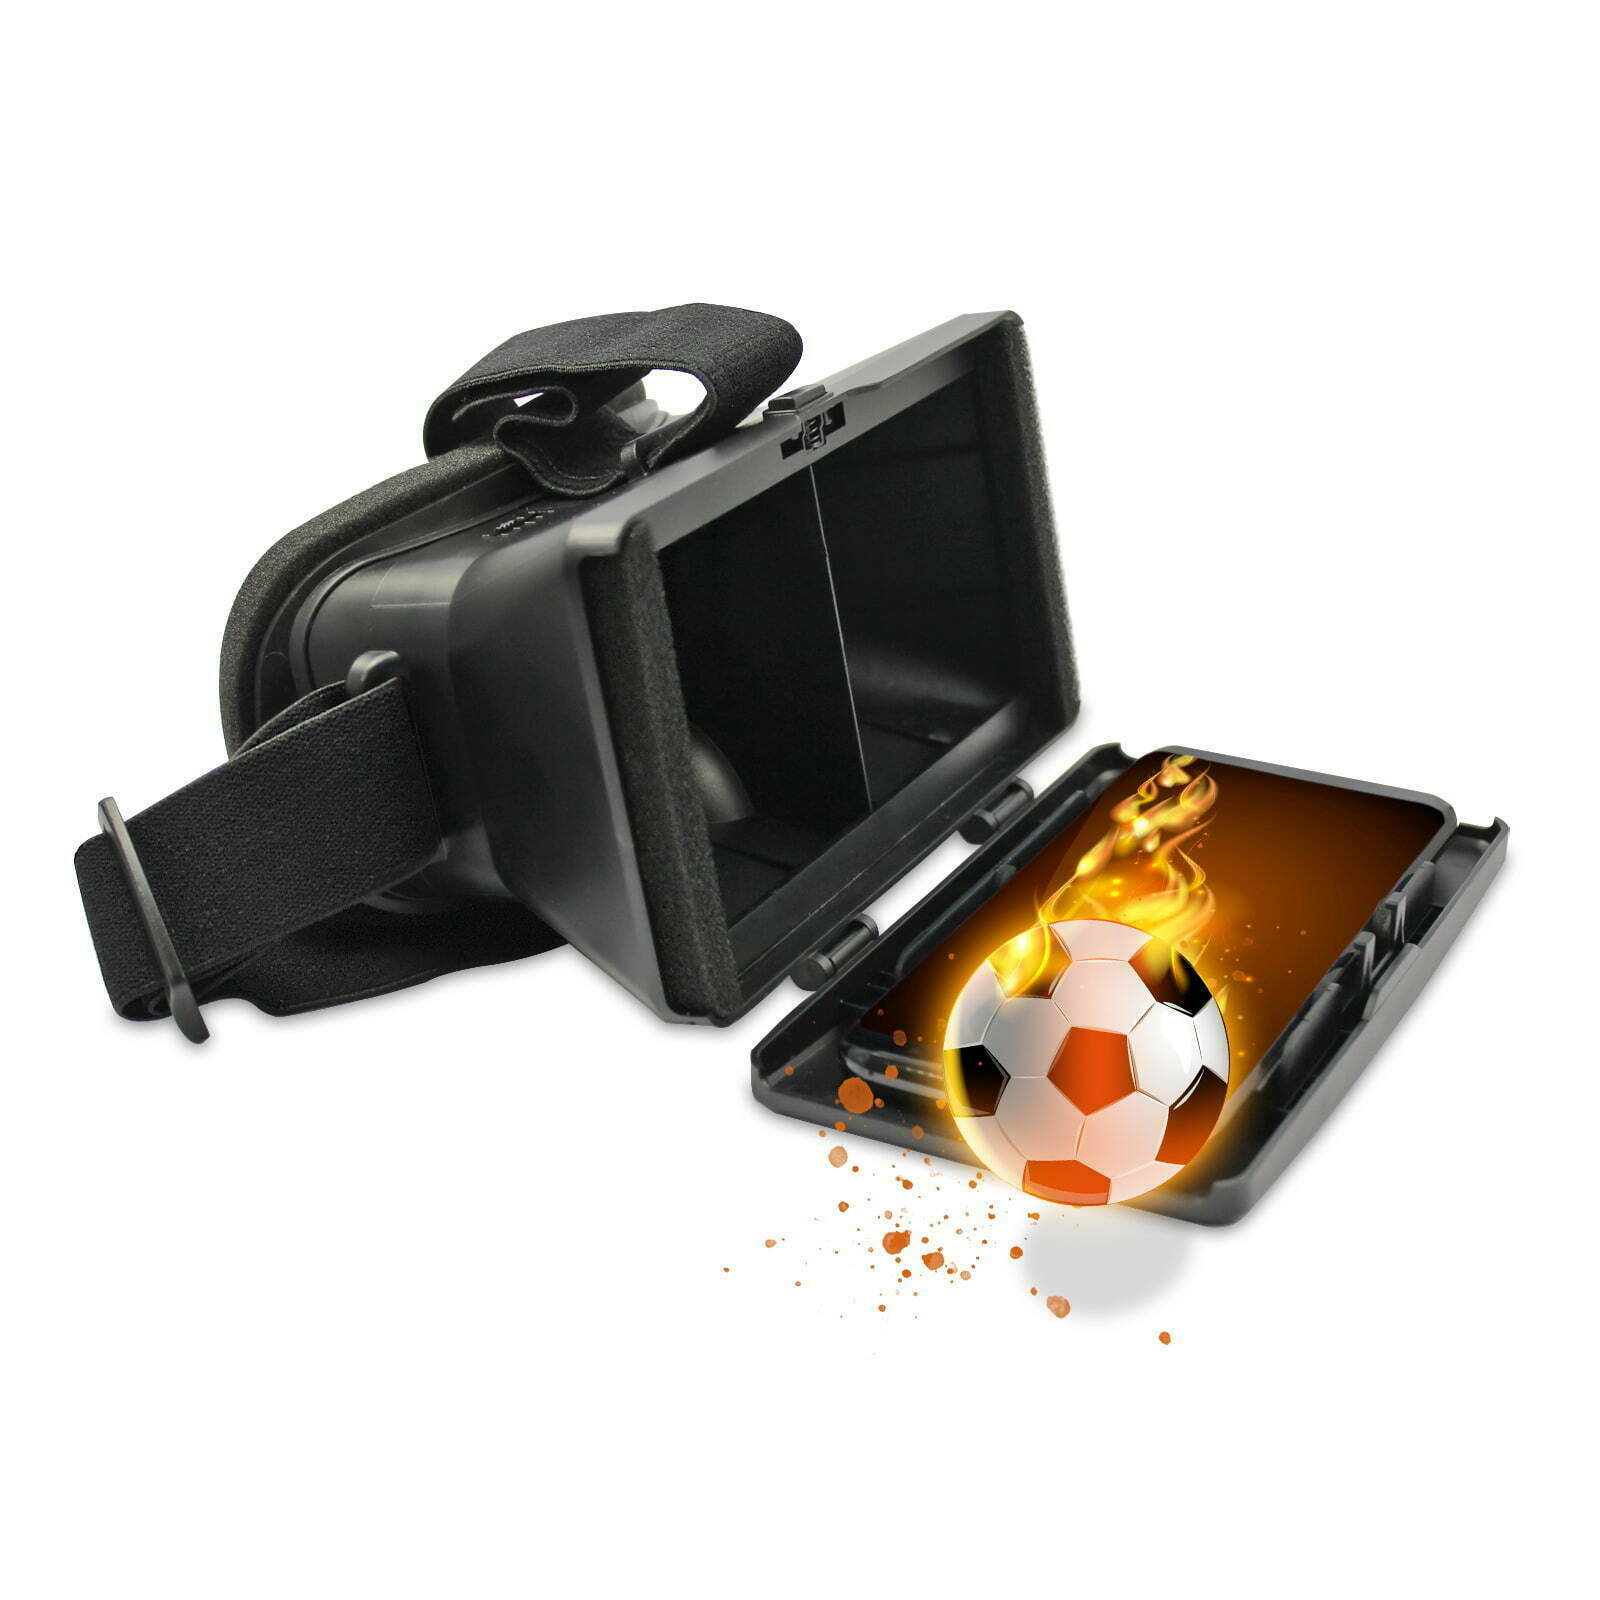 3D VR Brille schwarz für Huawei Y7 2019 Virtual Reality Box Glasses